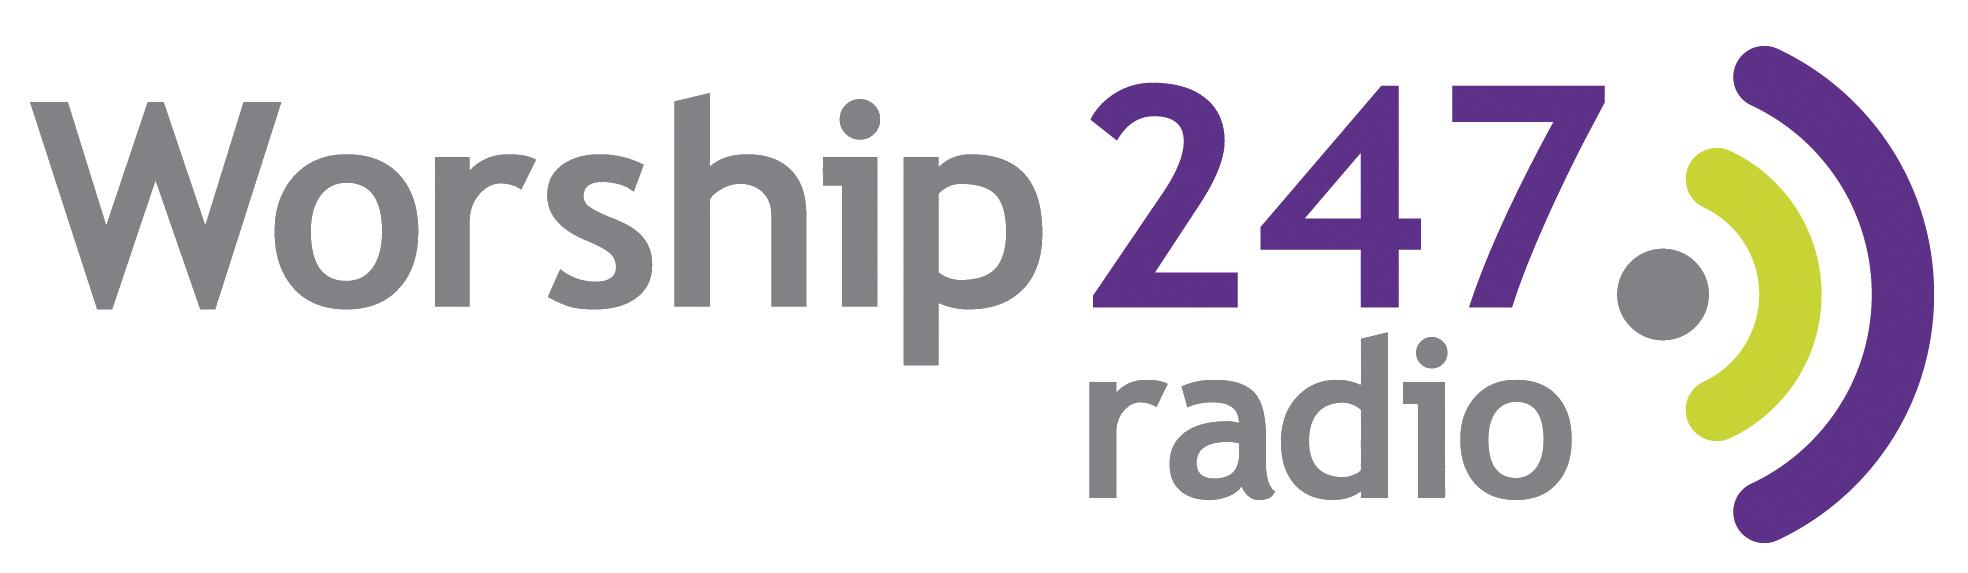 Worshipradio247